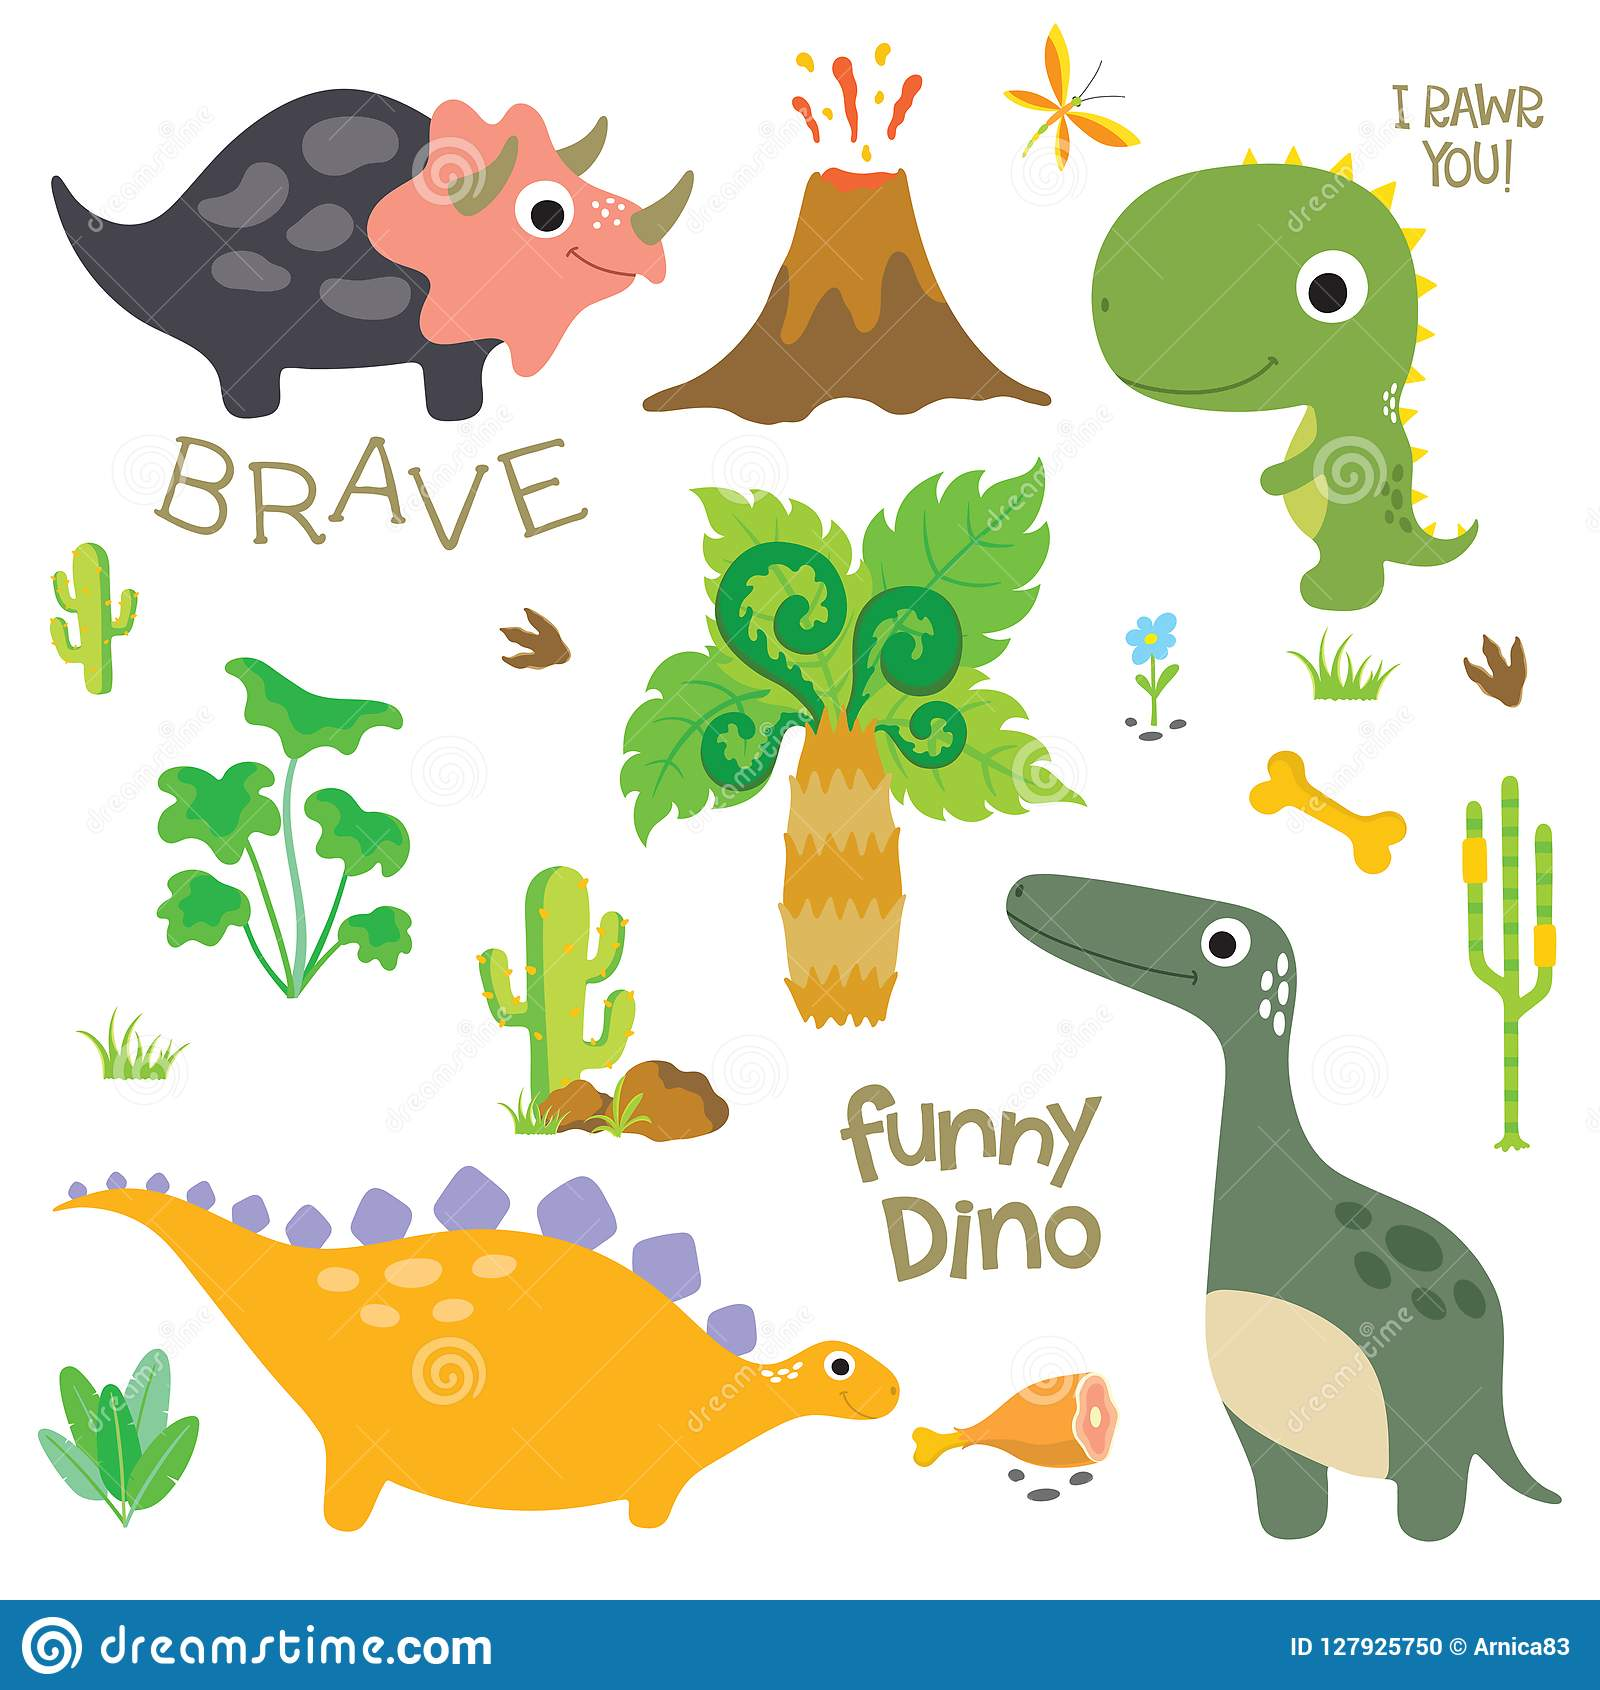 Dinosaurusvoetafdruk, Vulkaan, Palm en andere ontwerpelementen